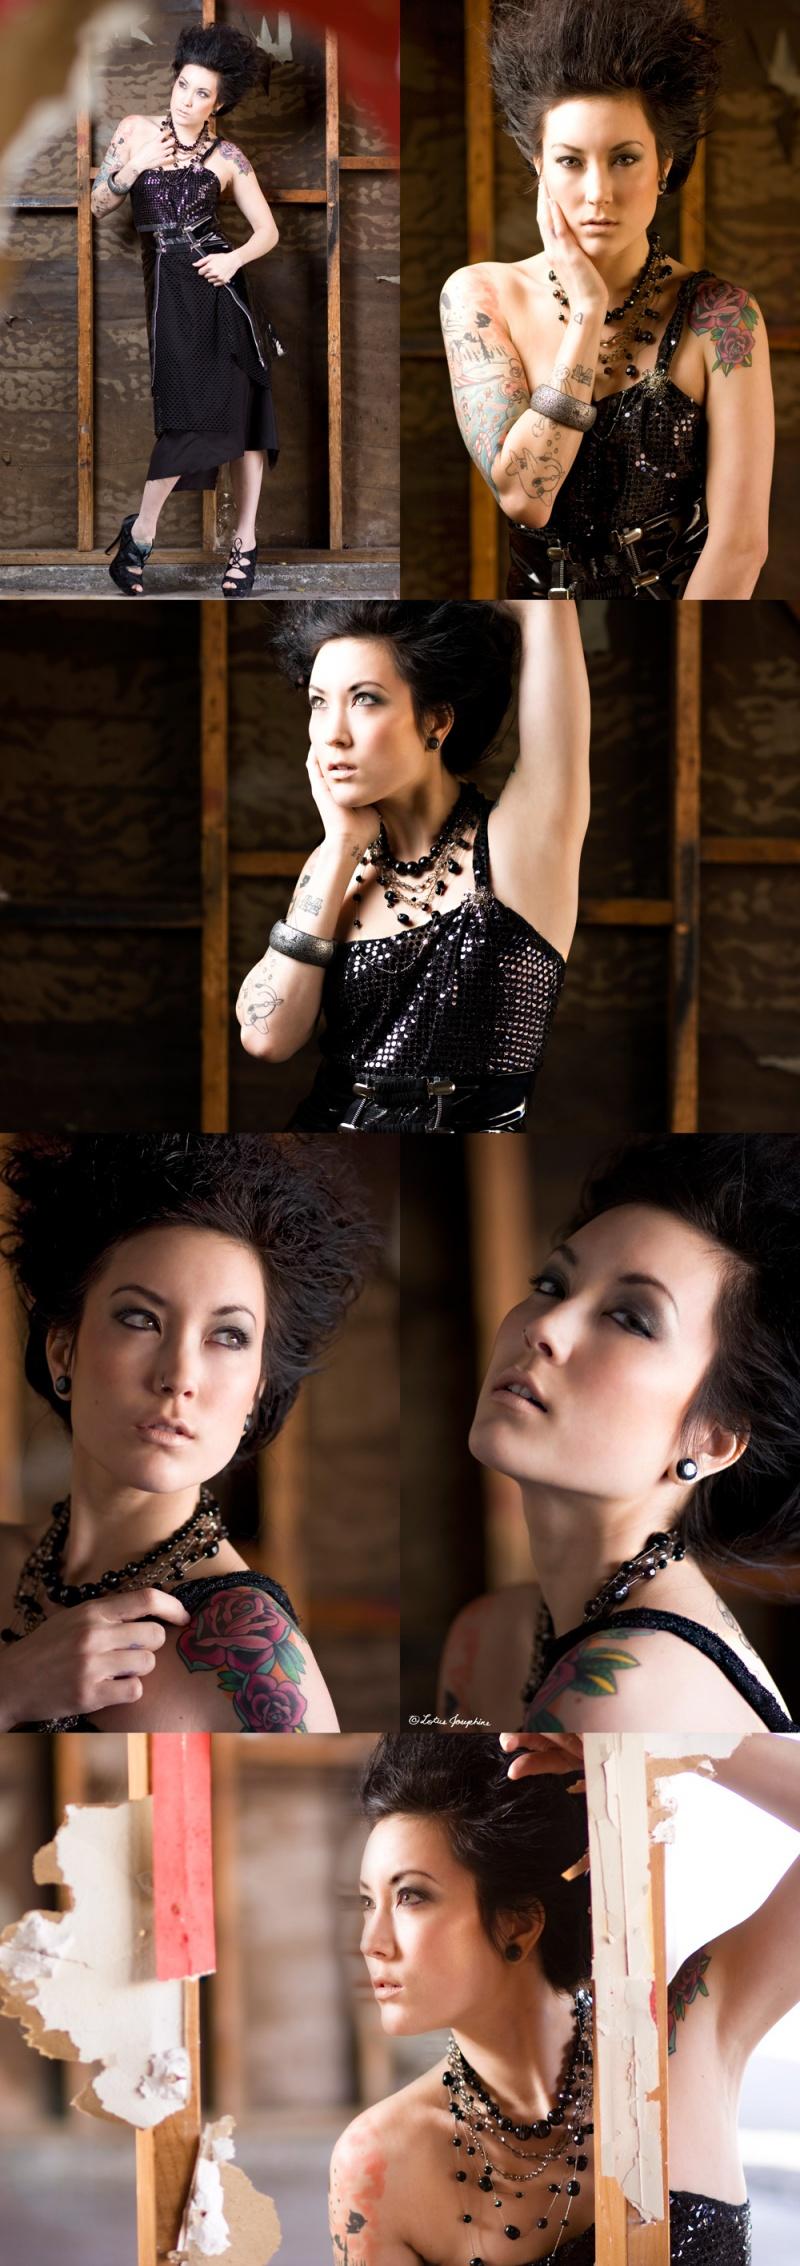 Female model photo shoot of Alena Dawn Stylist MUA and Brittany Bao by Lotus Josephine Studios, makeup by Nicole True and Erica Acevedo